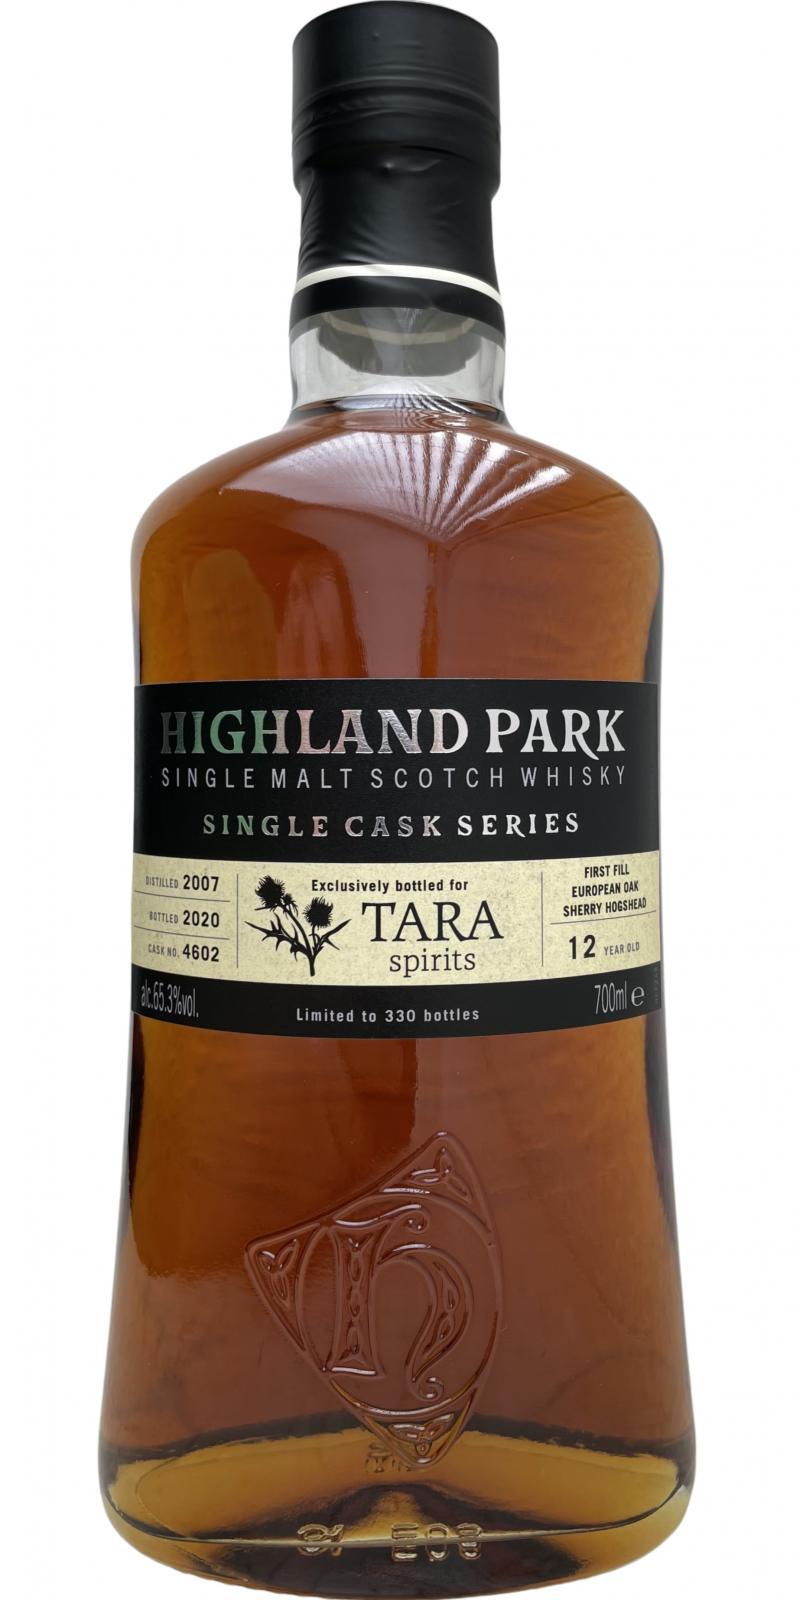 Highland Park 2007